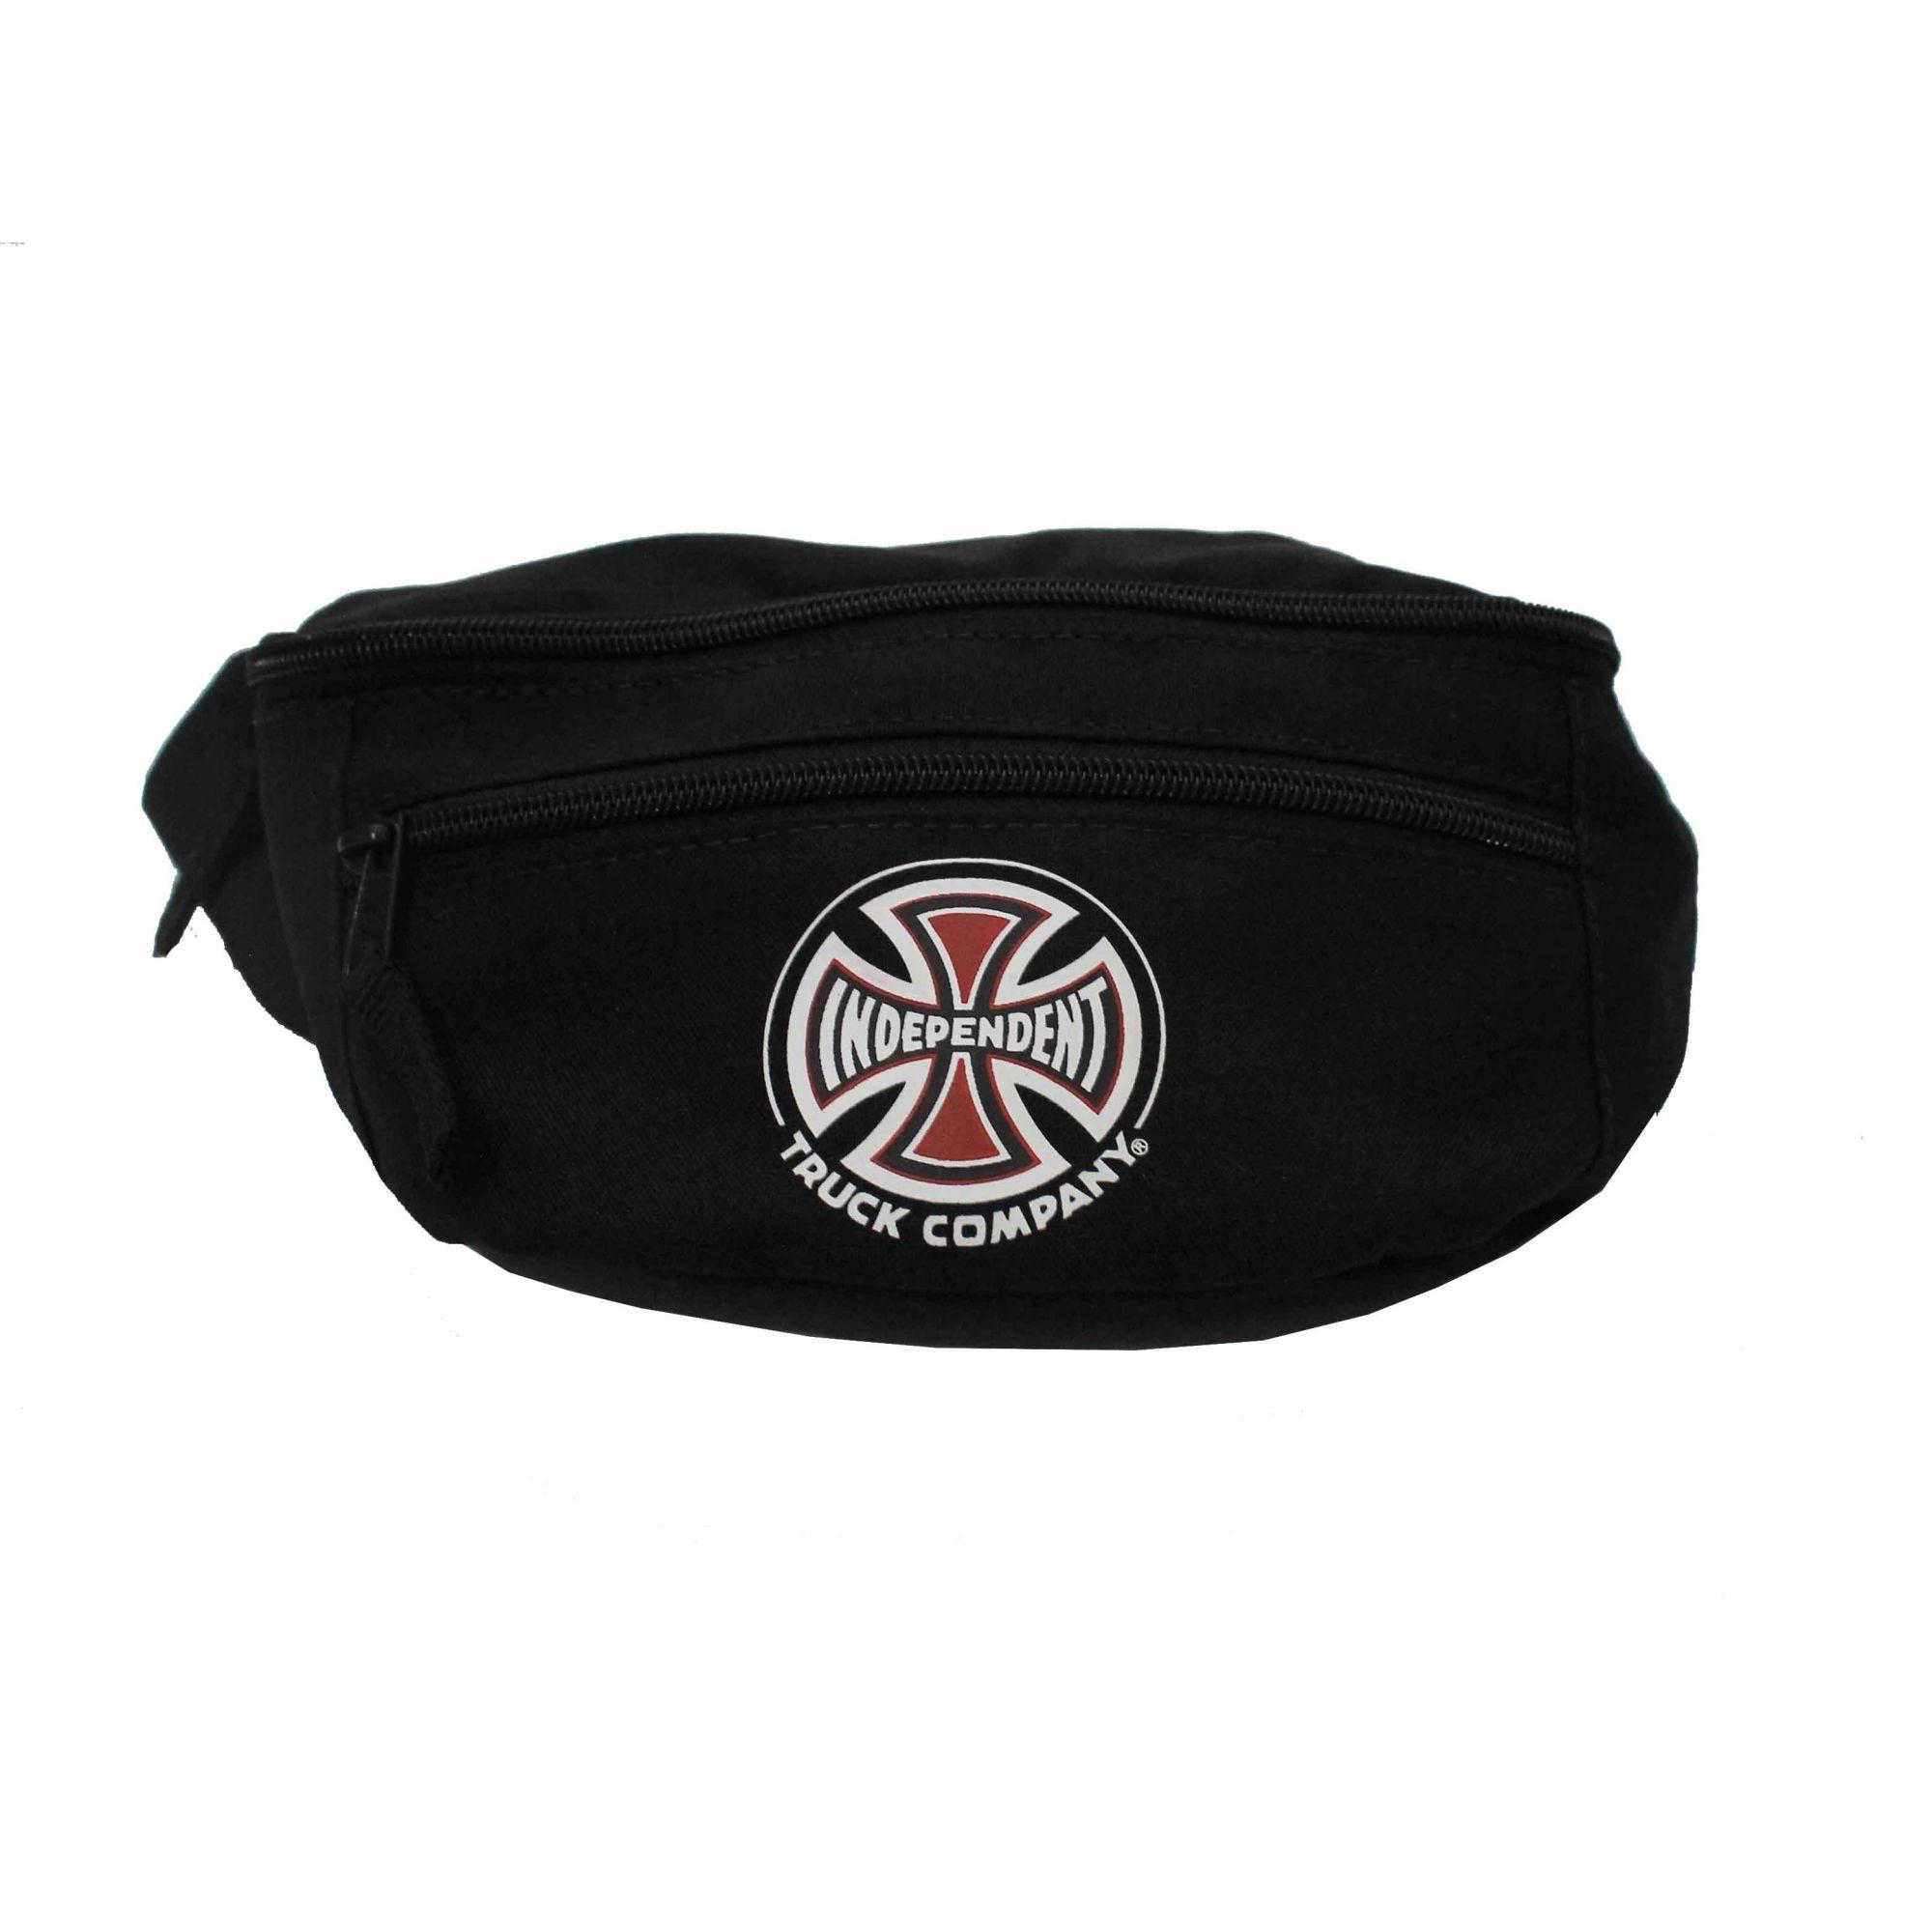 Pochete Independent Truck Company Bag Pack Black